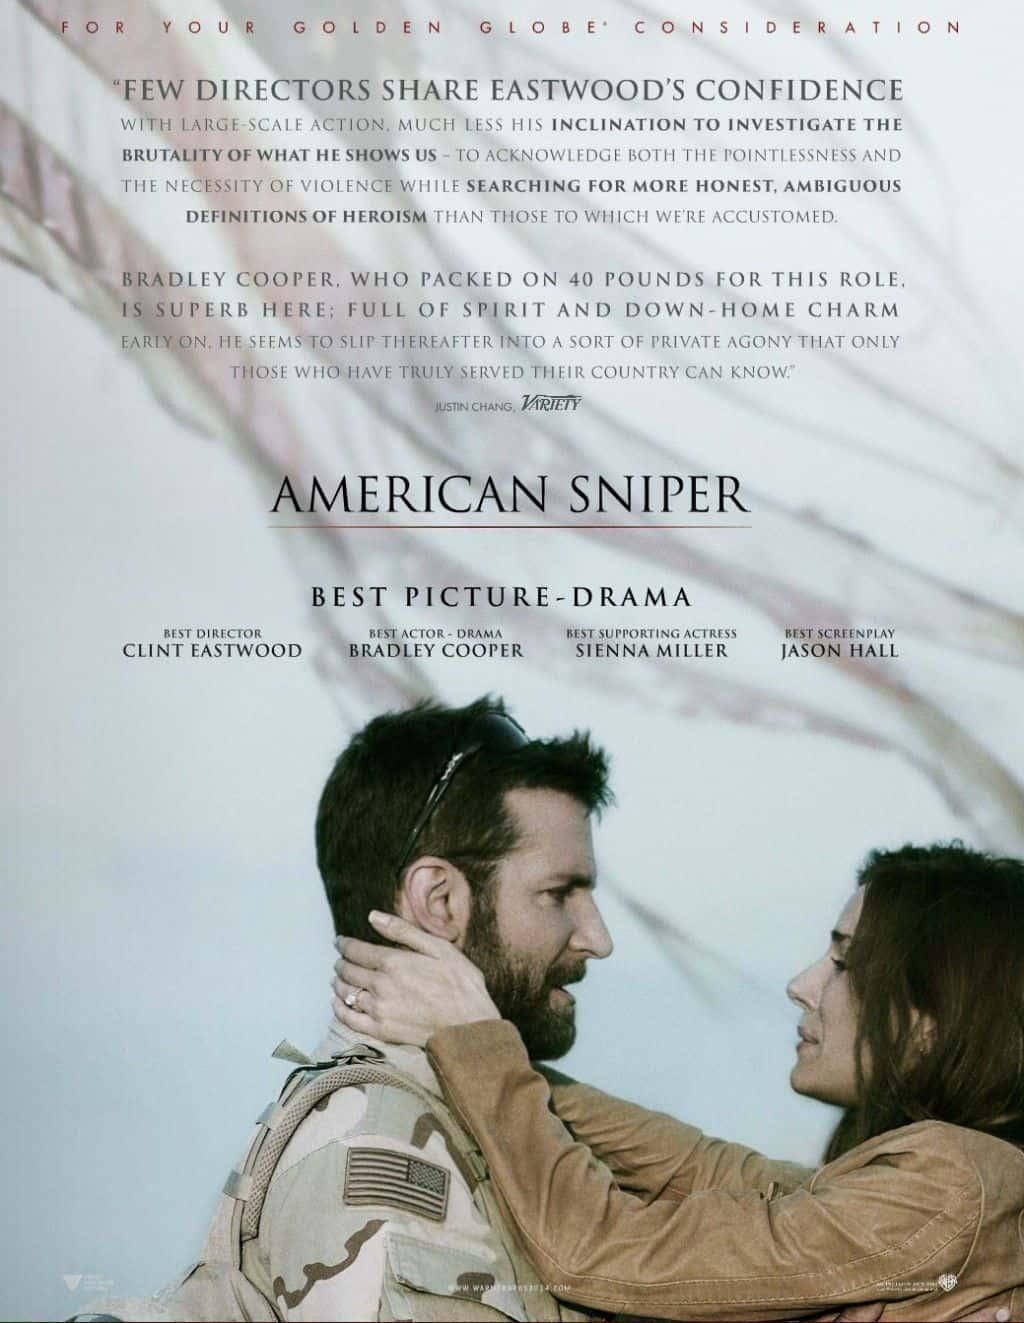 Francotirador (American Sniper): película bélica más taquillera de la historia